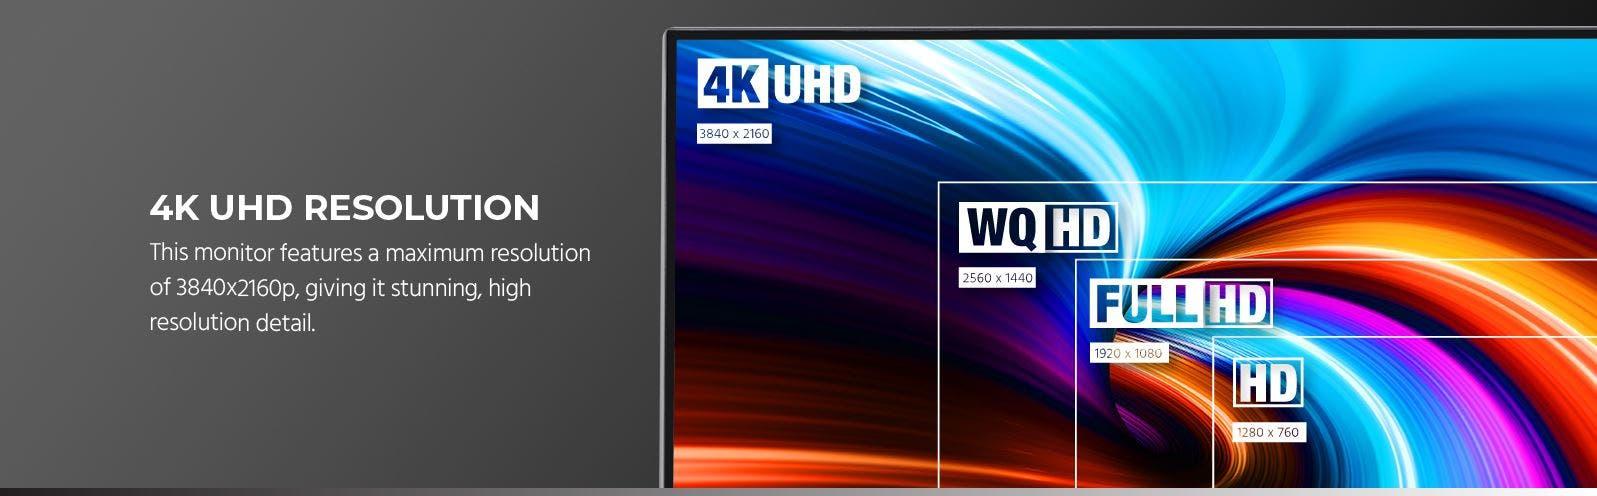 4K UHD Monitor